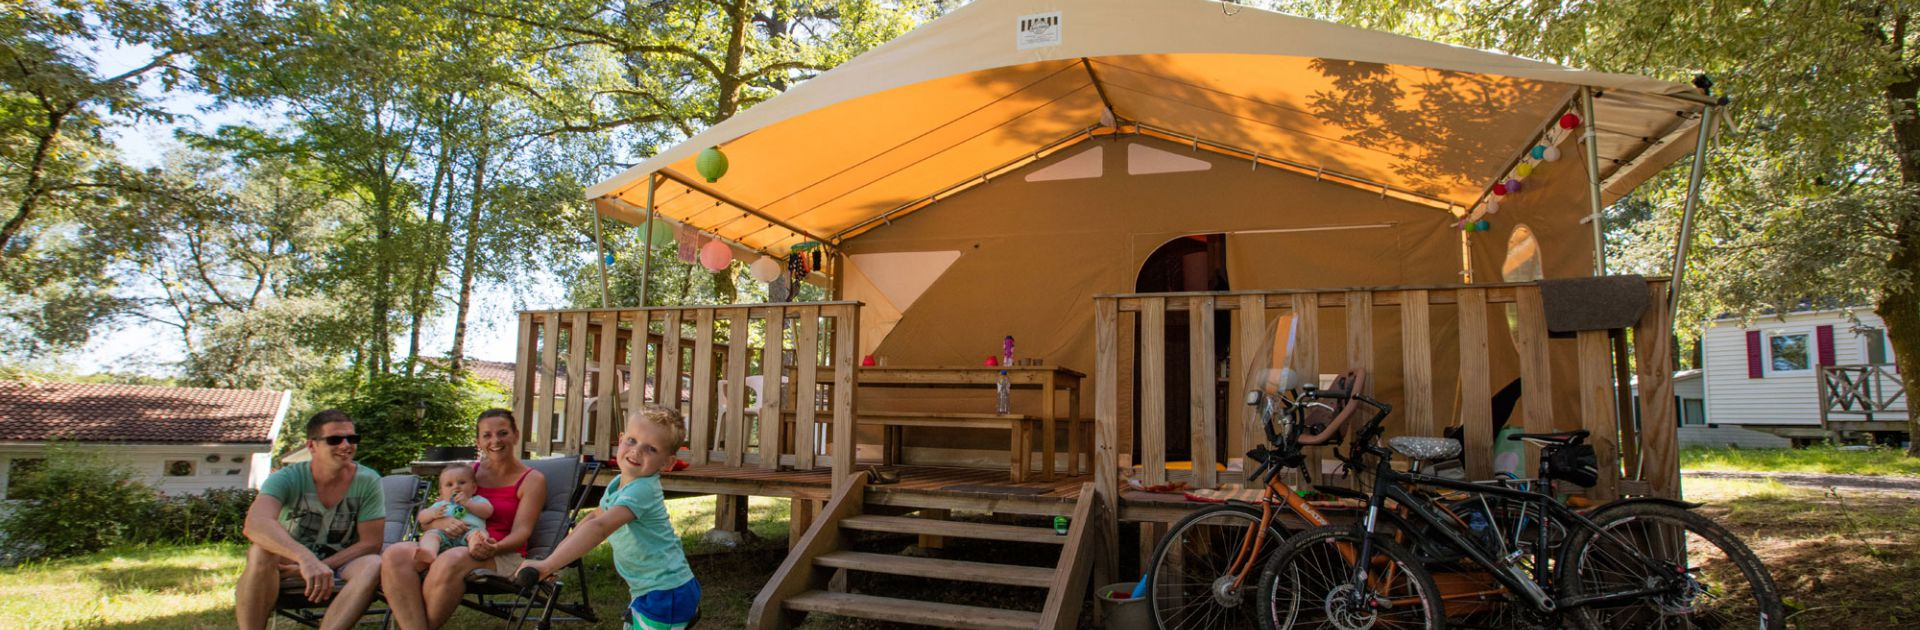 locatie Périgord tent lodge